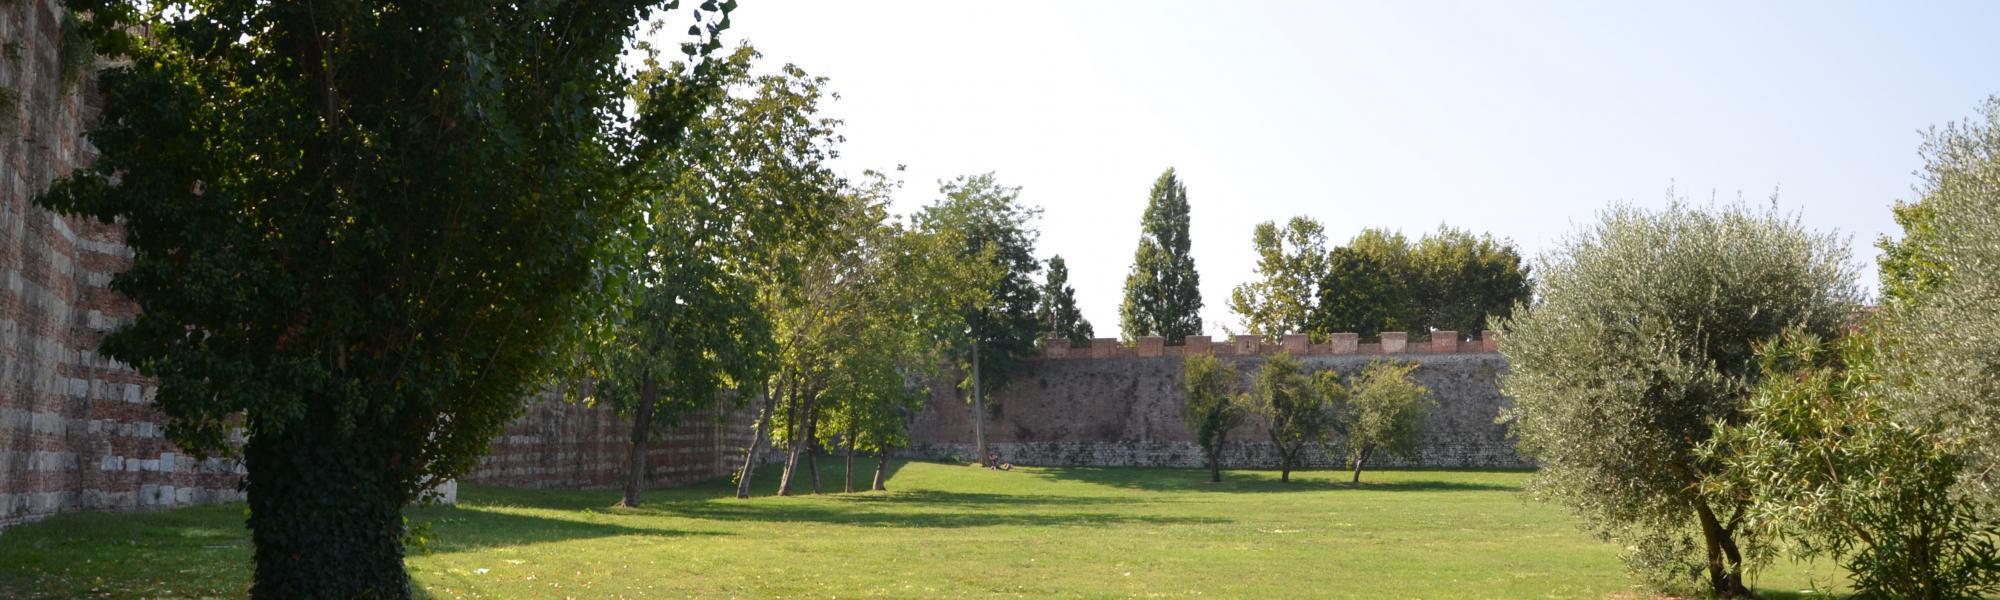 Veduta parco delle Concette (L. Corevi, Comune di Pisa)